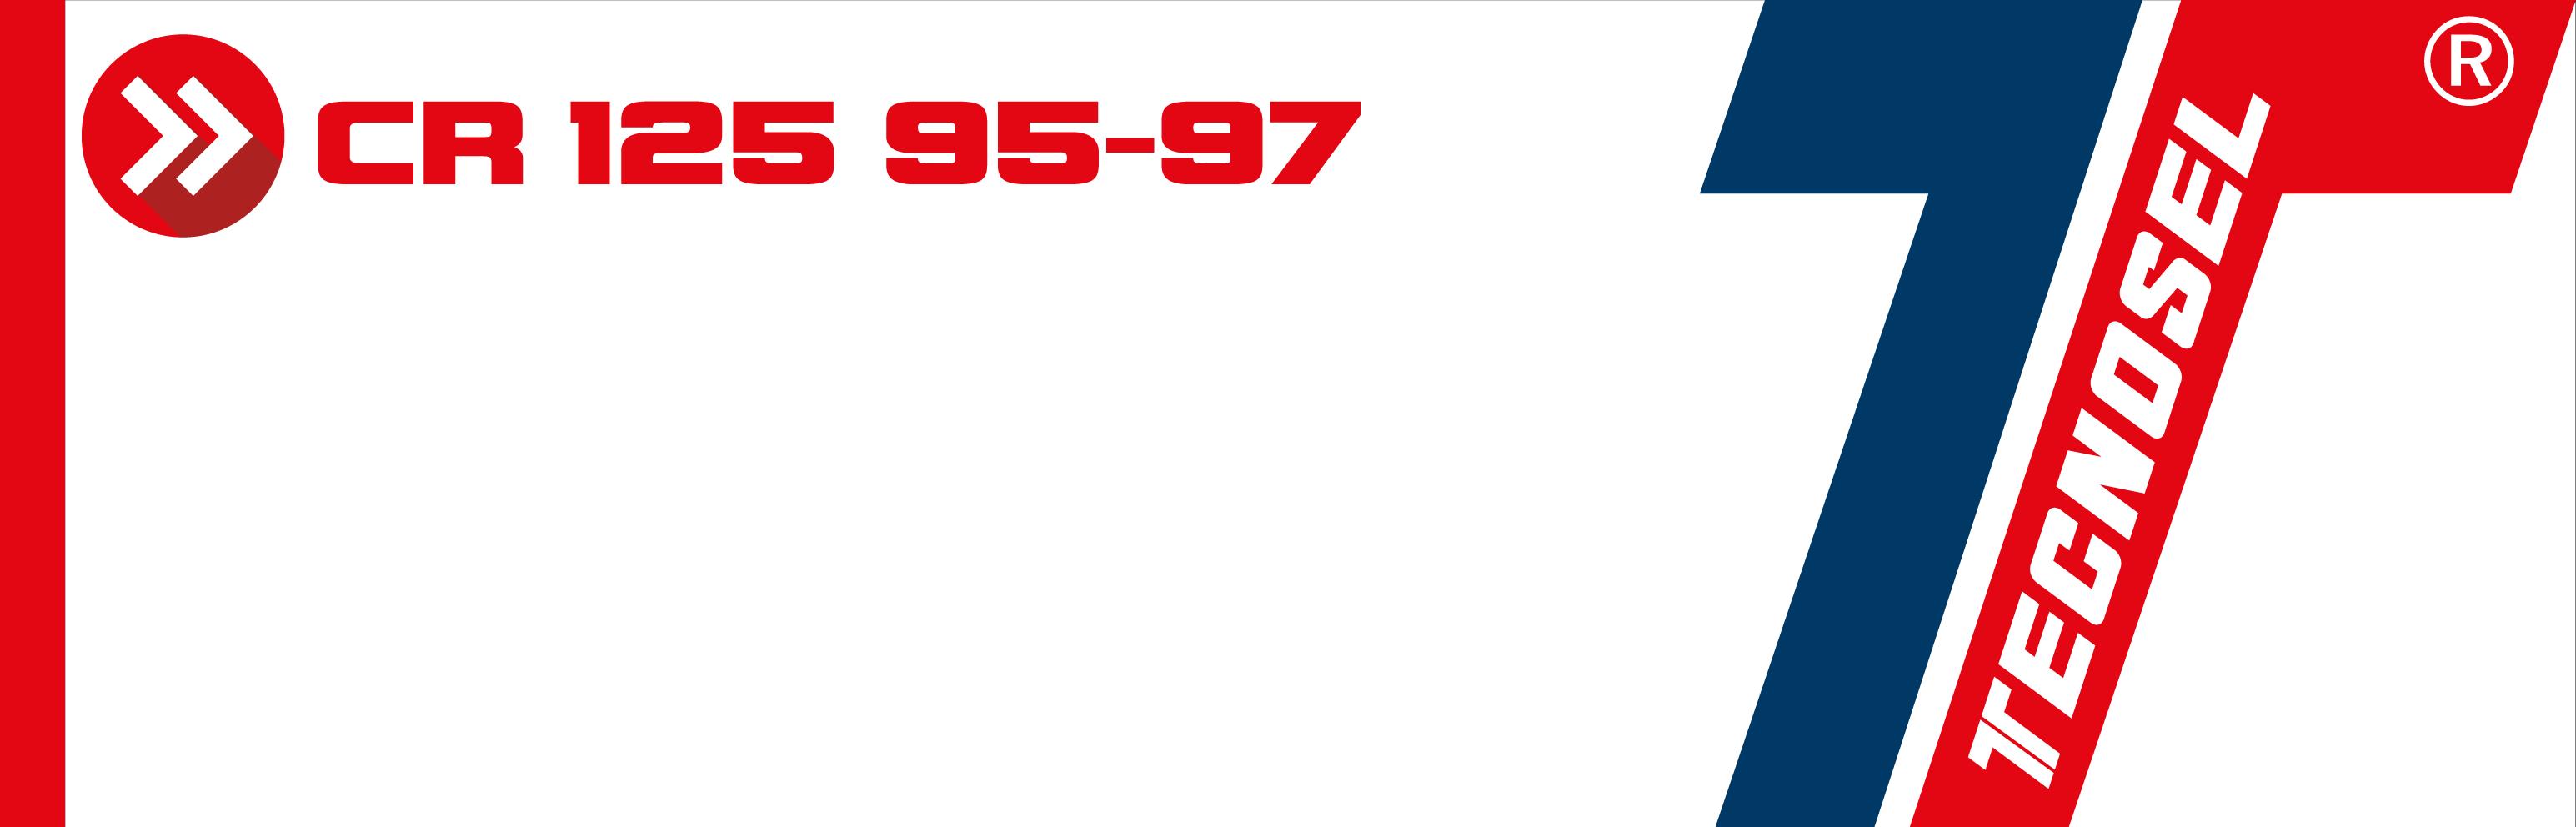 CR 125 95>97